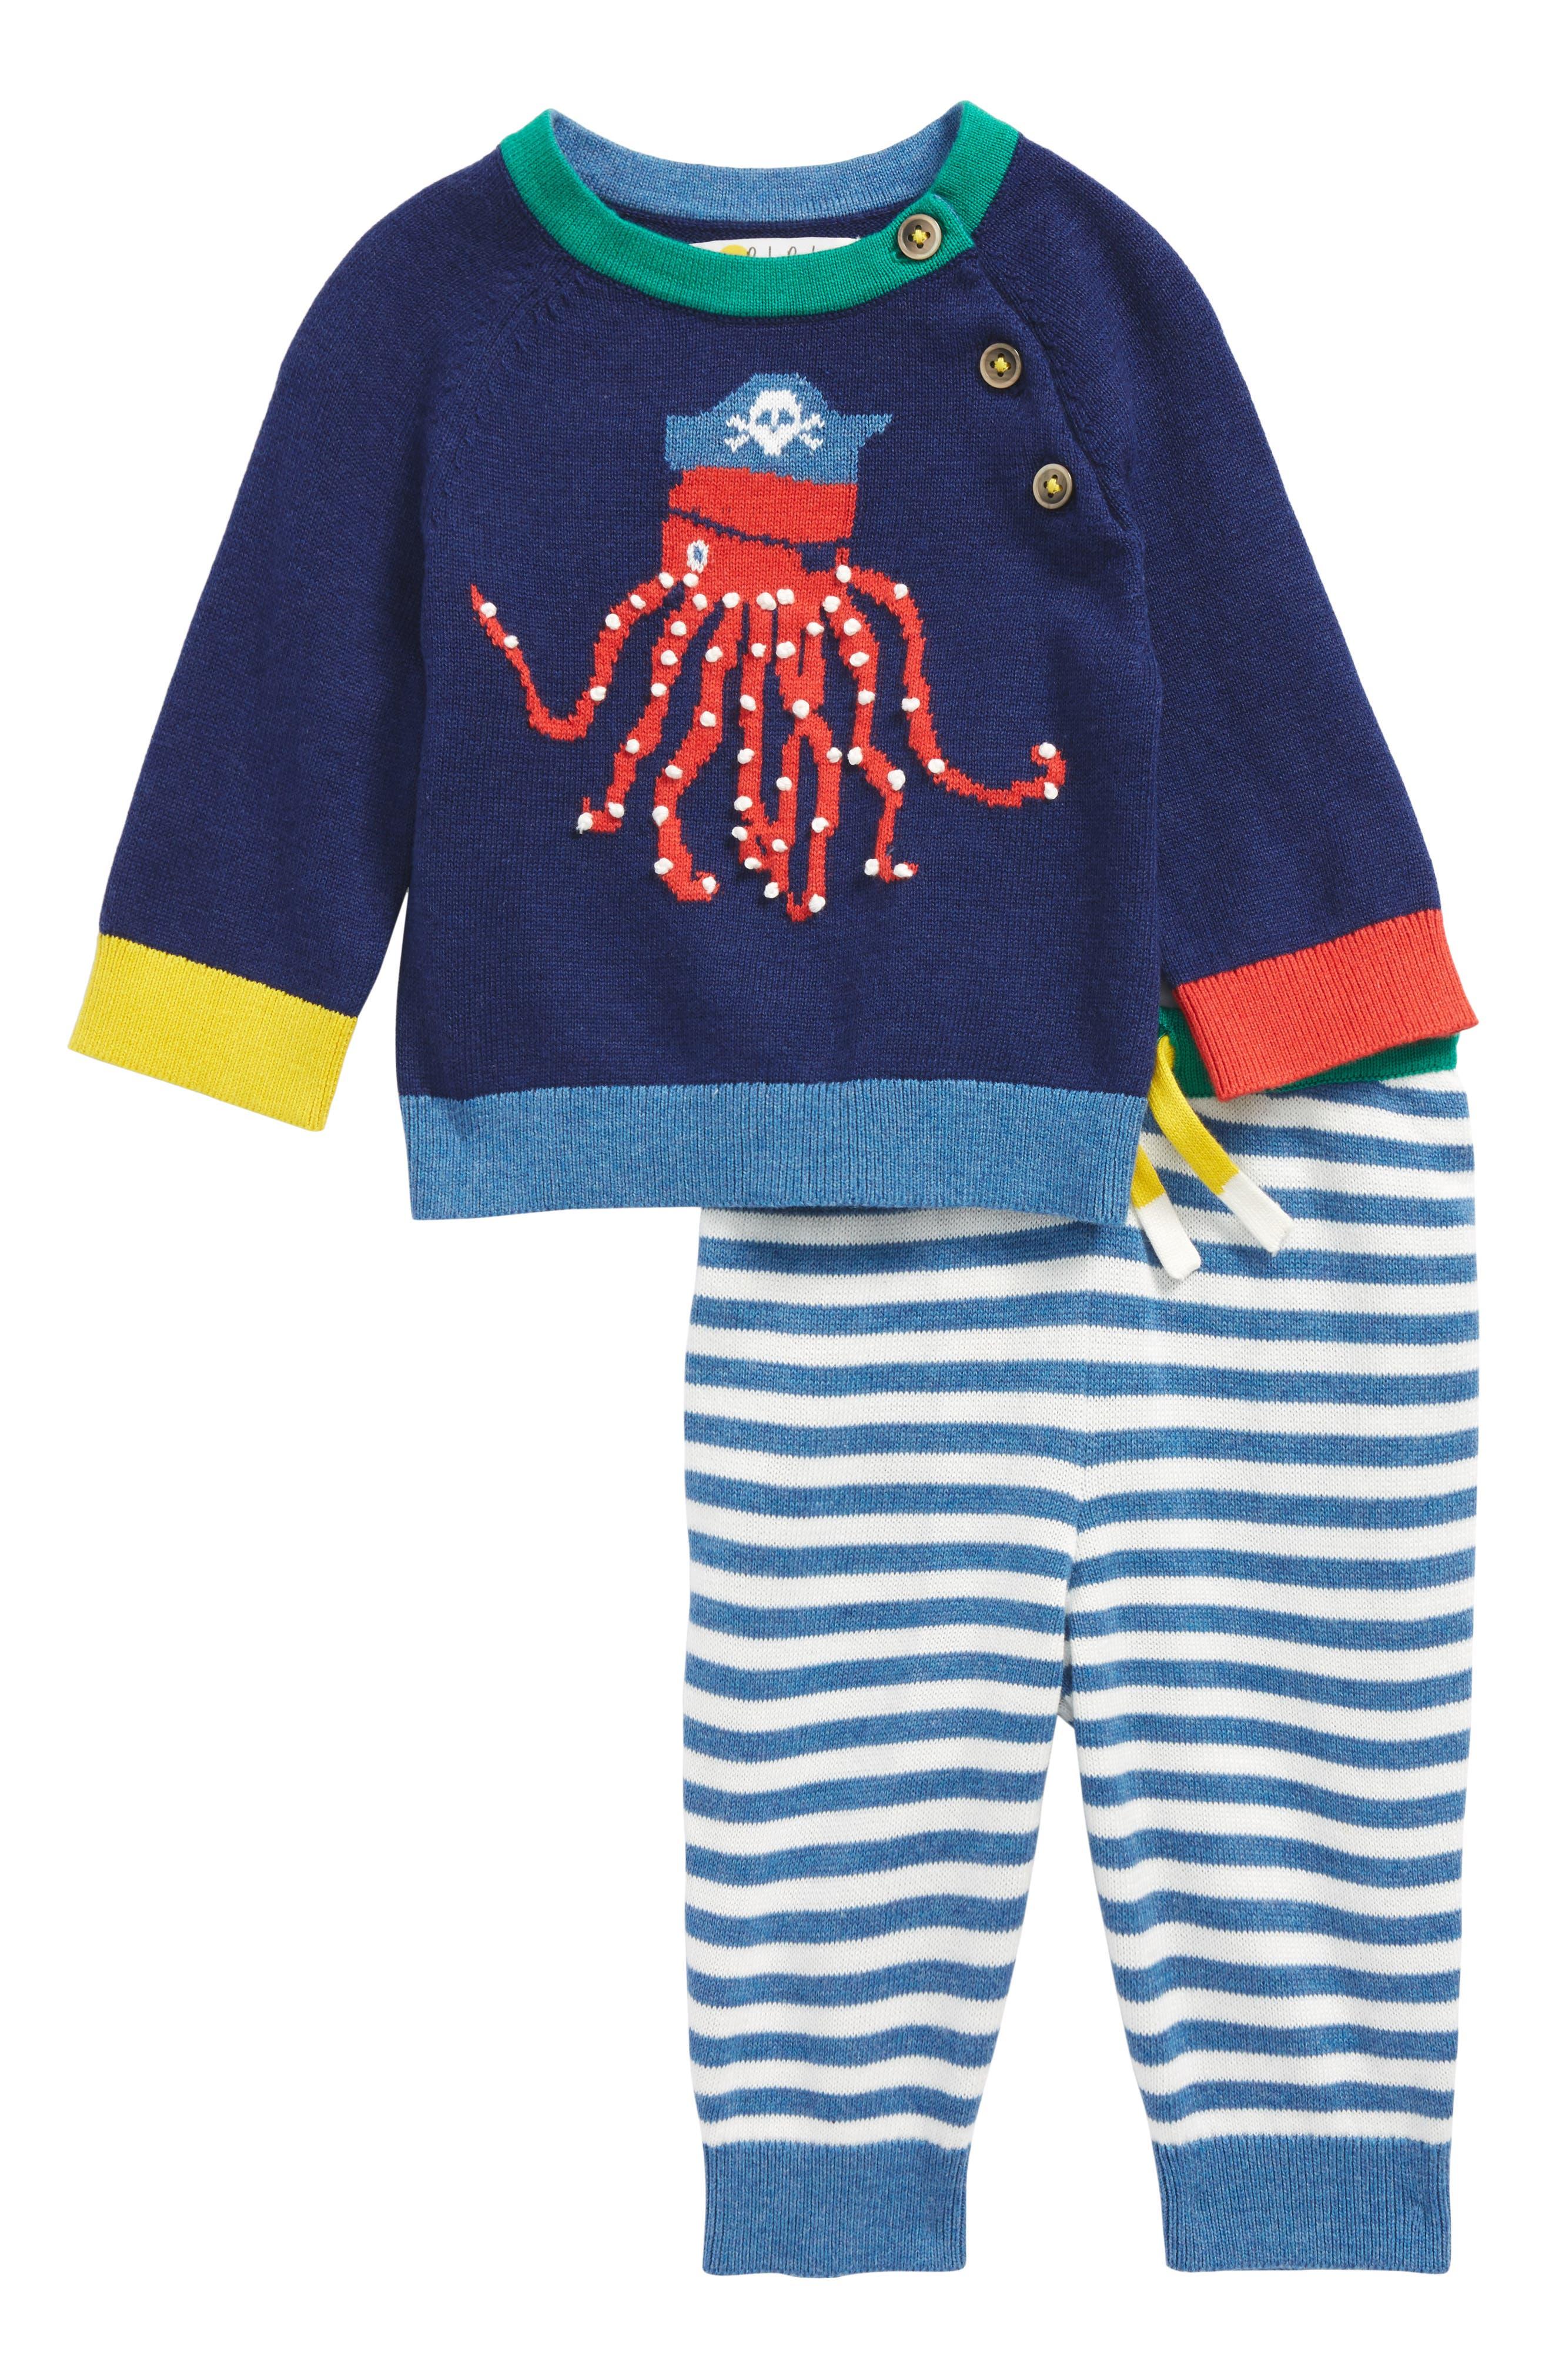 Octopus Sweater & Pants Set,                             Main thumbnail 1, color,                             424